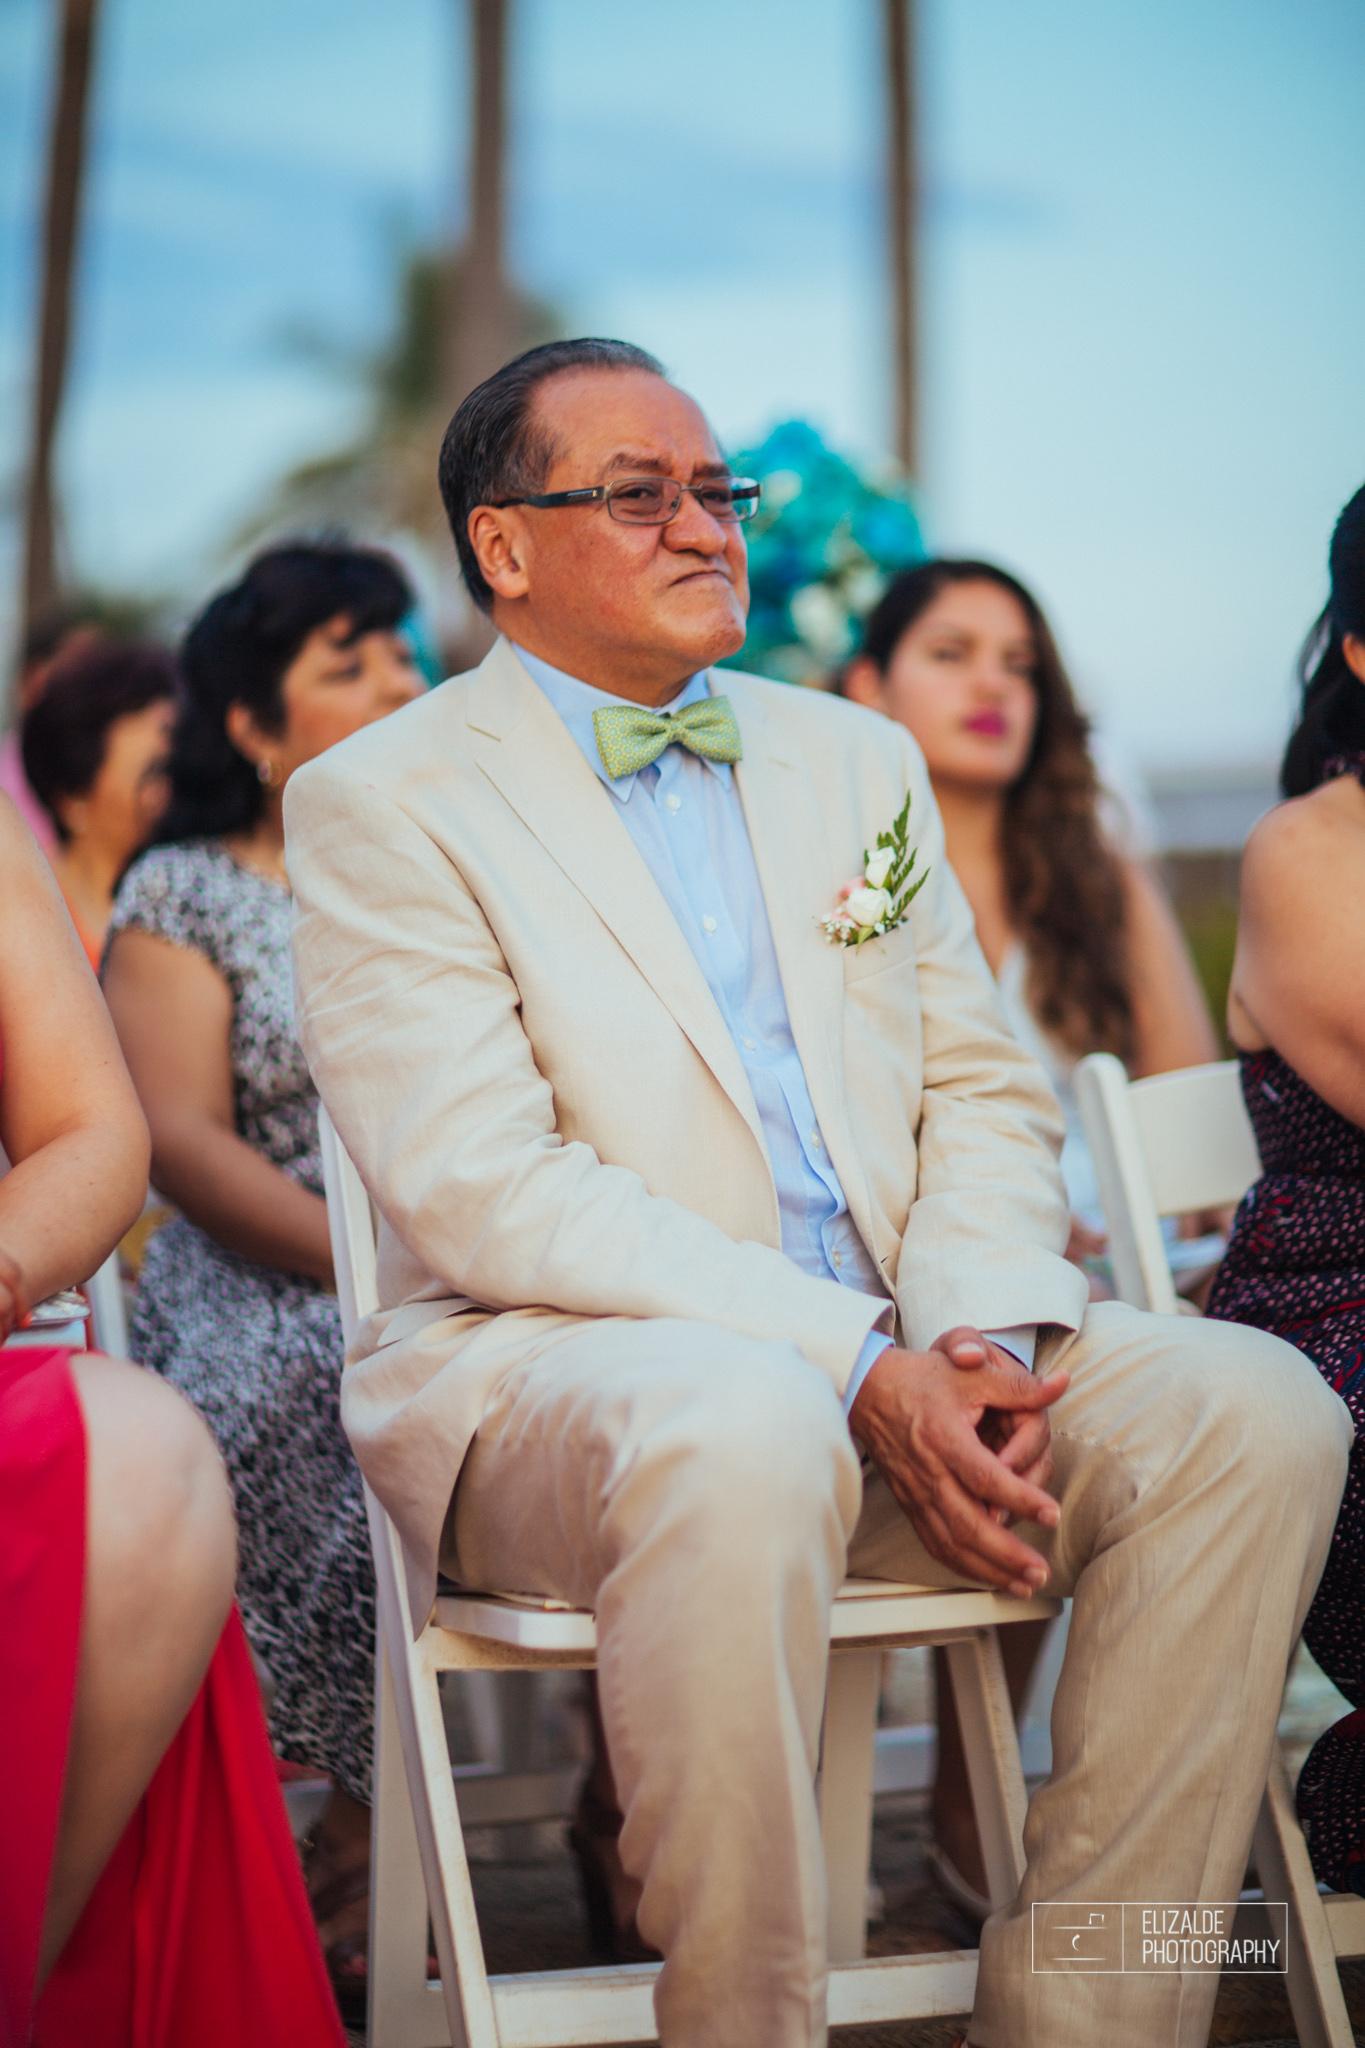 Pay and Ferran_Acapulco_Destination Wedding_Elizalde Photography-90.jpg